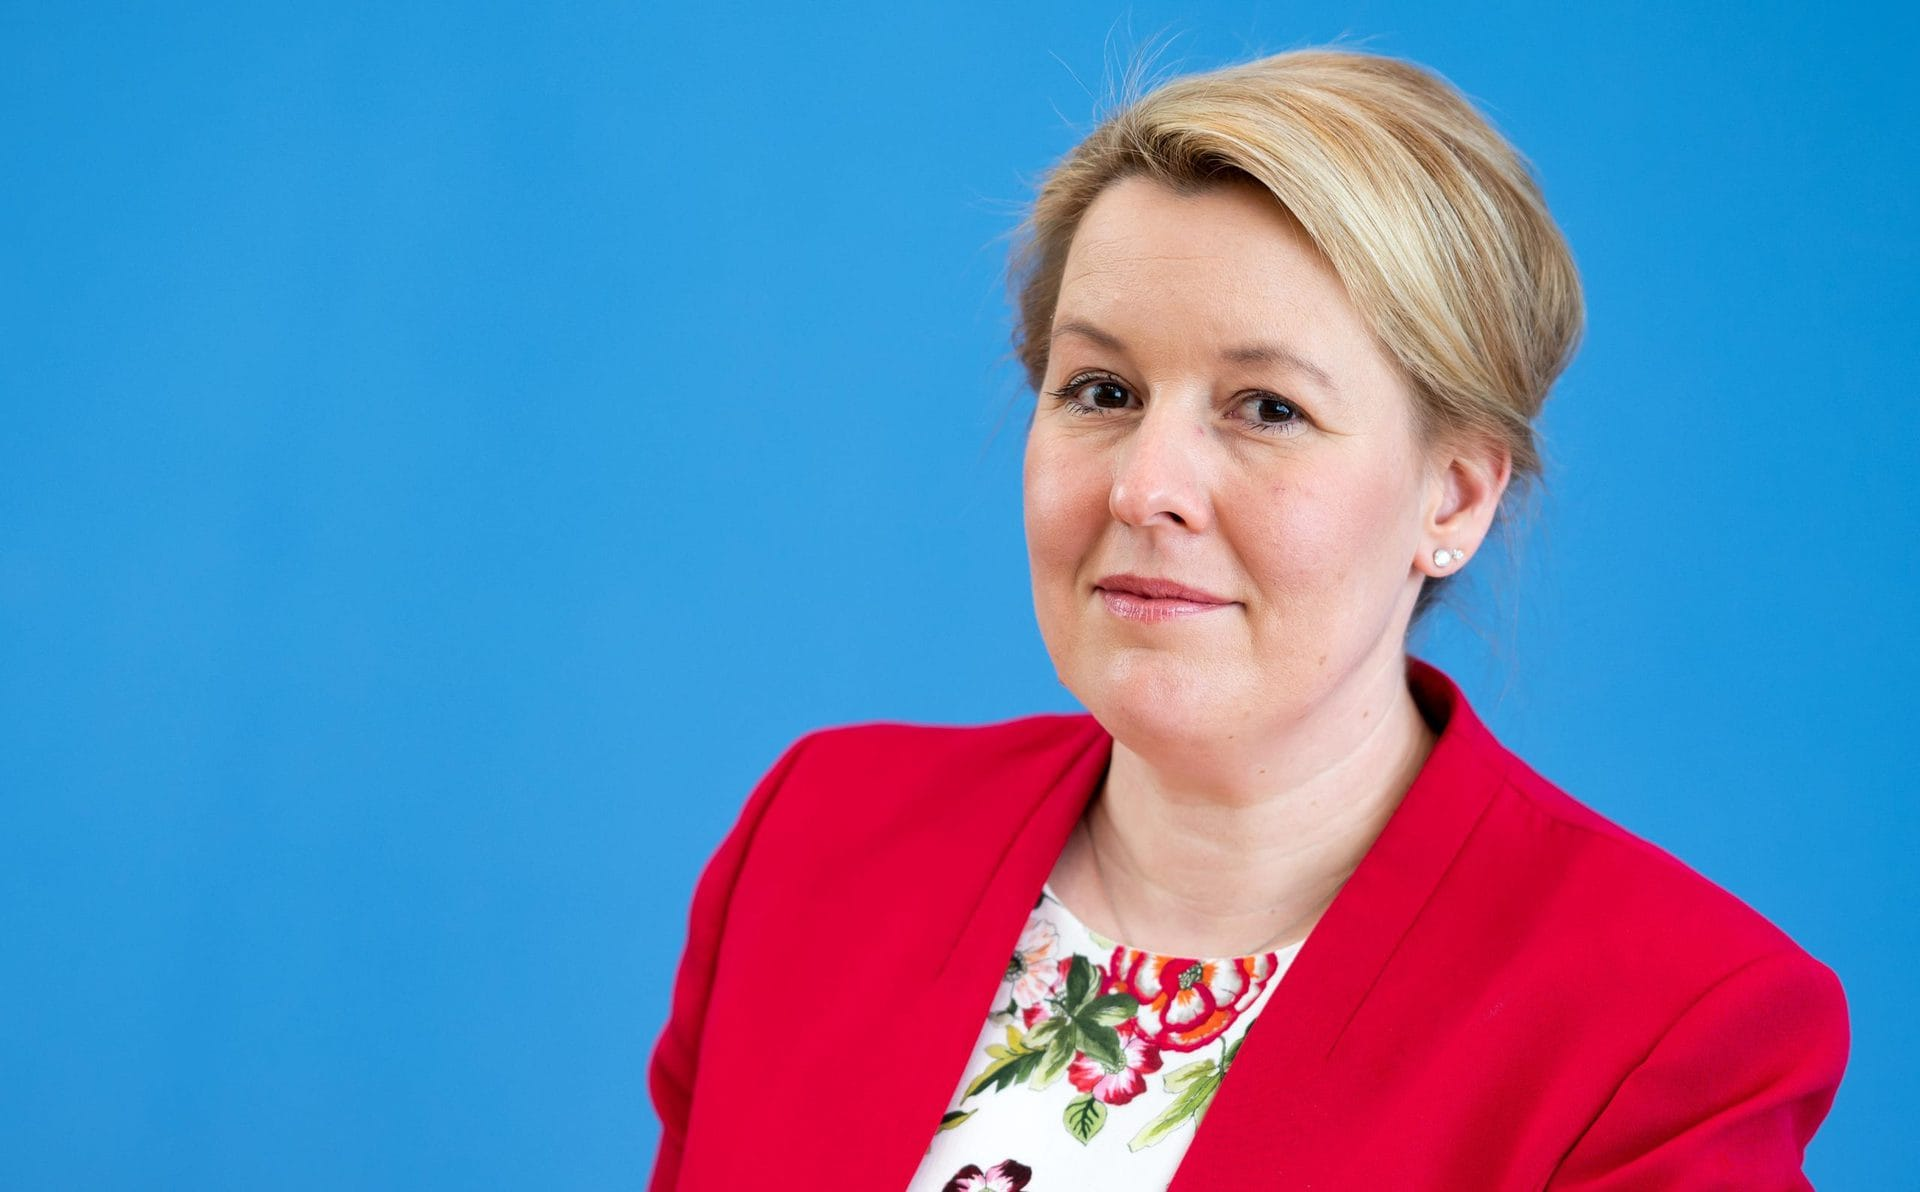 Bundesfamilienministerin Franziska Giffey tritt zurück Doktorarbeit